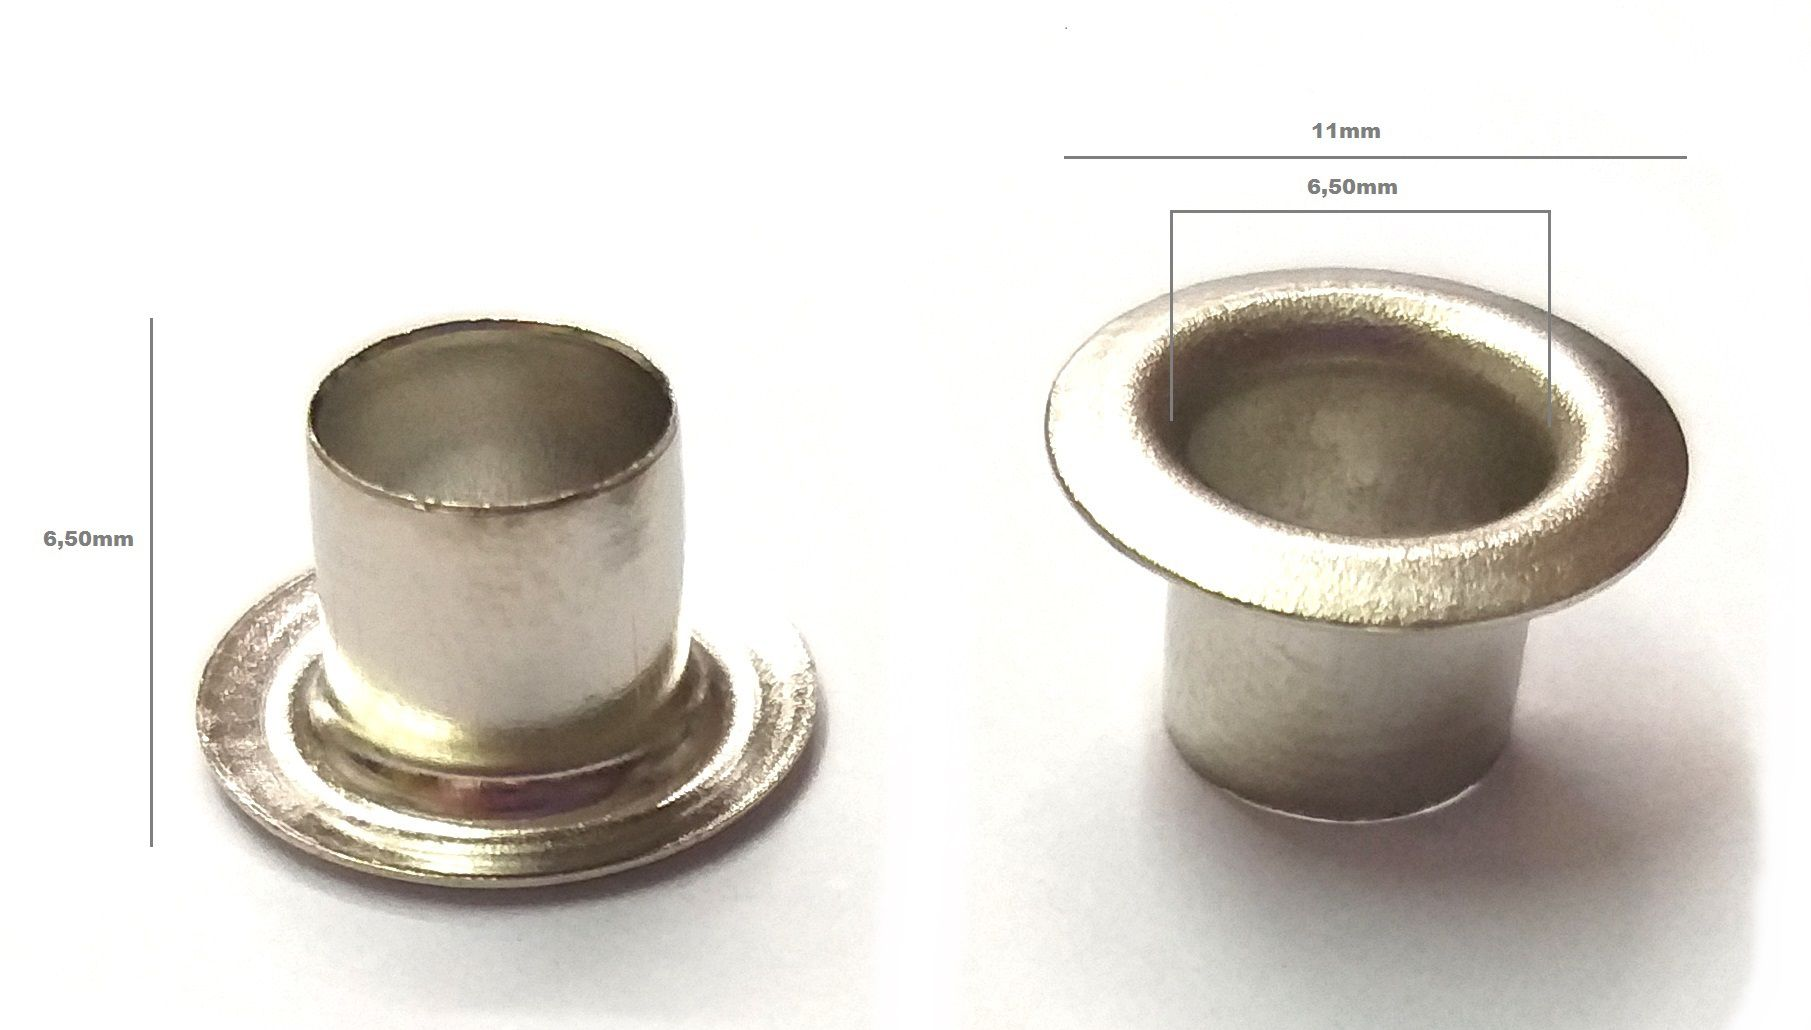 Ilhós Alumínio Nº 50 - 11mm de diâmetro externo